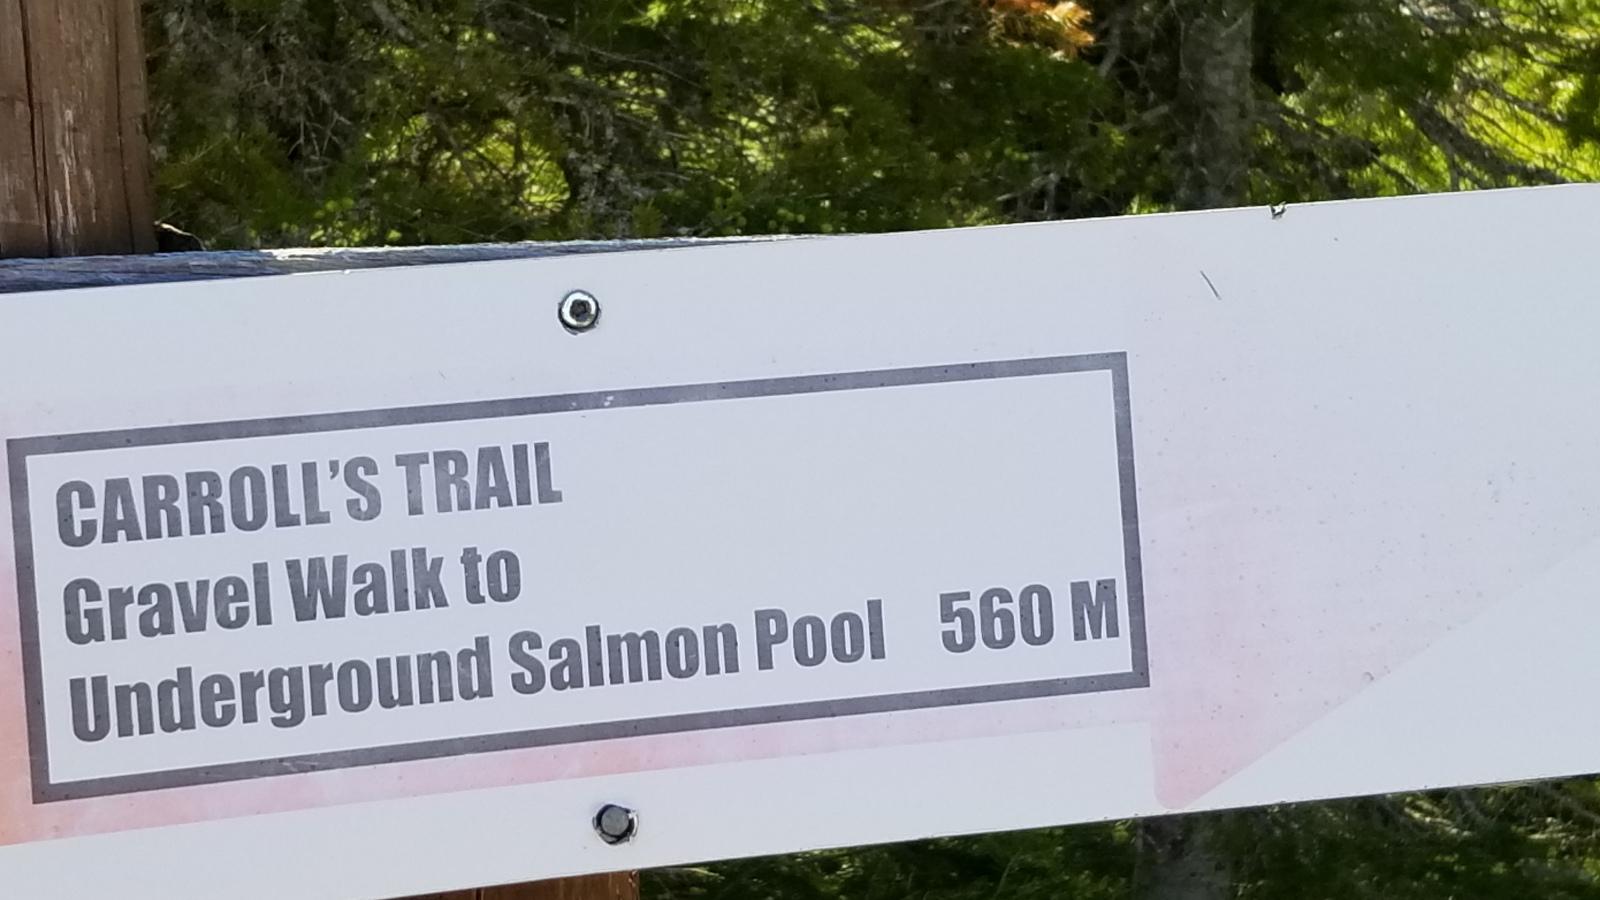 Underground Salmon Pool - Bob's Newfoundland - Roddickton, NL